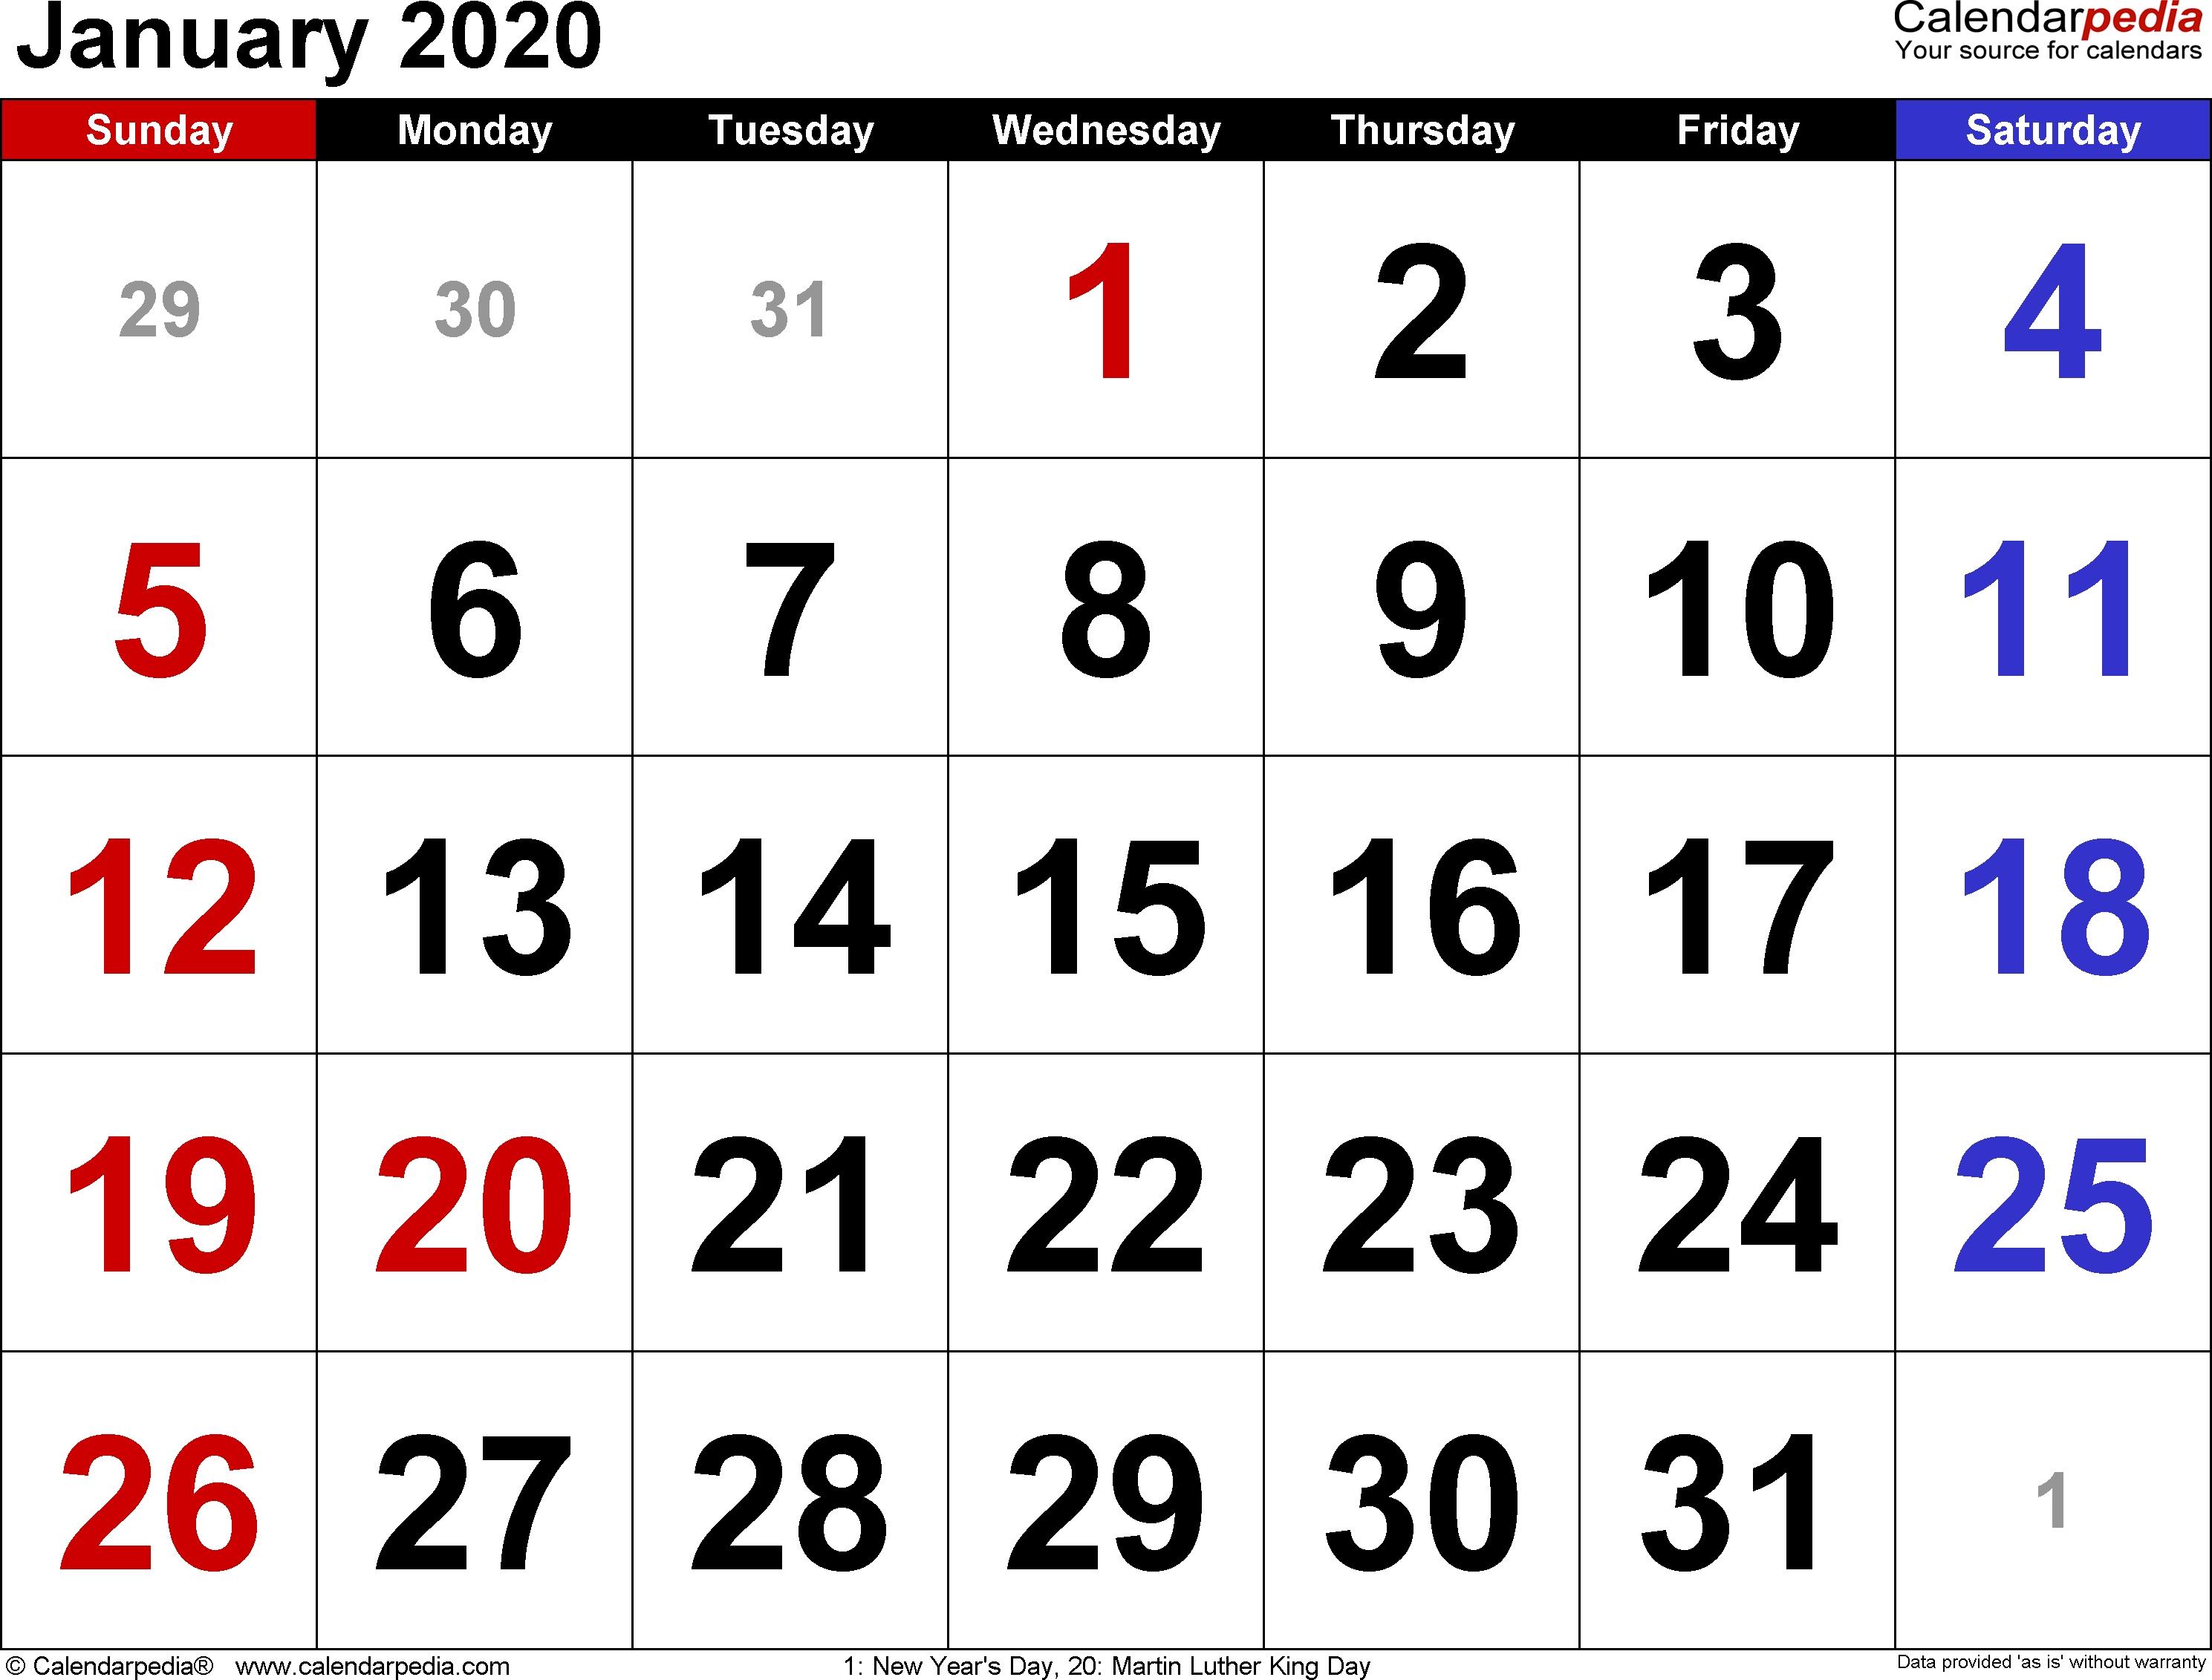 January 2020 Calendars For Word, Excel & Pdf-Large January 2020 Calendar